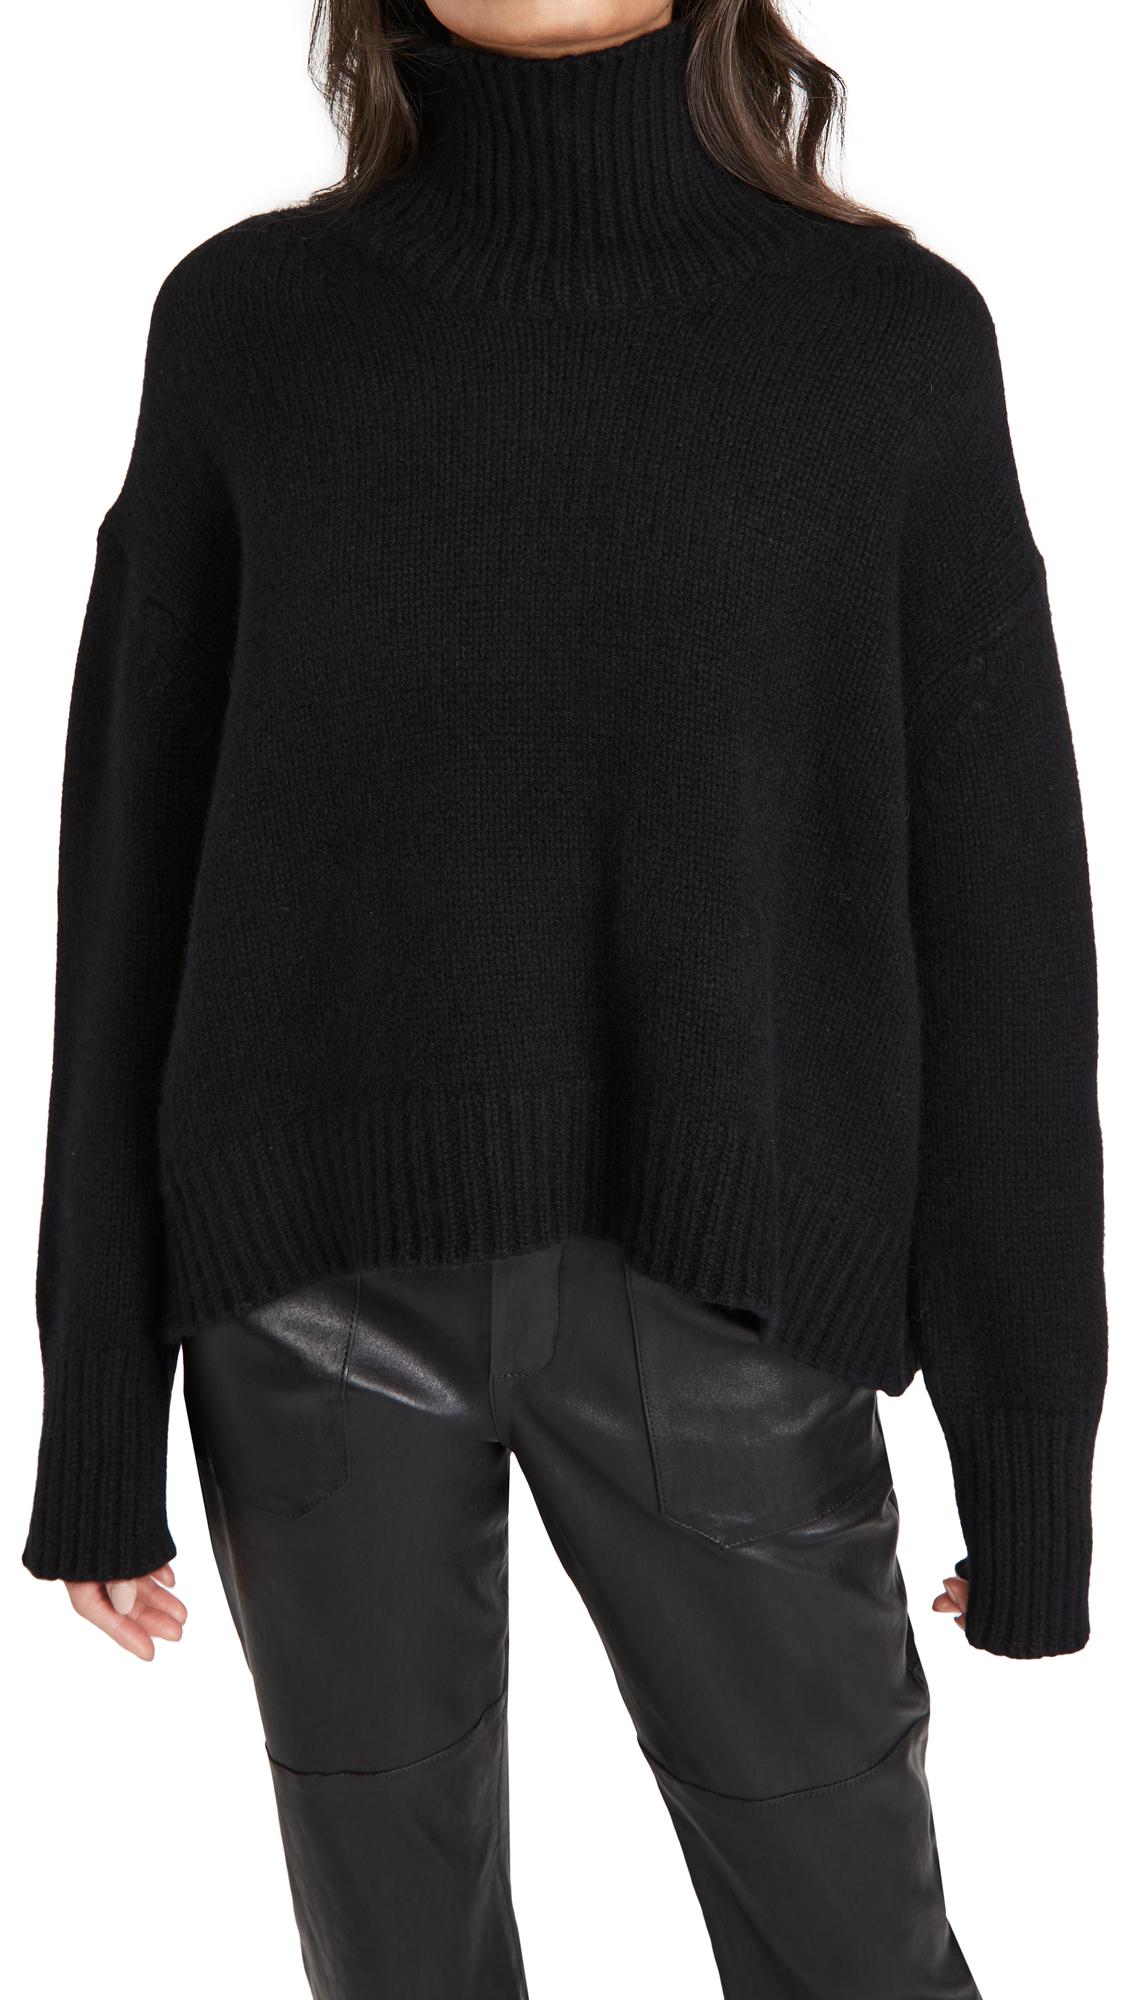 Sablyn Scarlett Cashmere Sweater